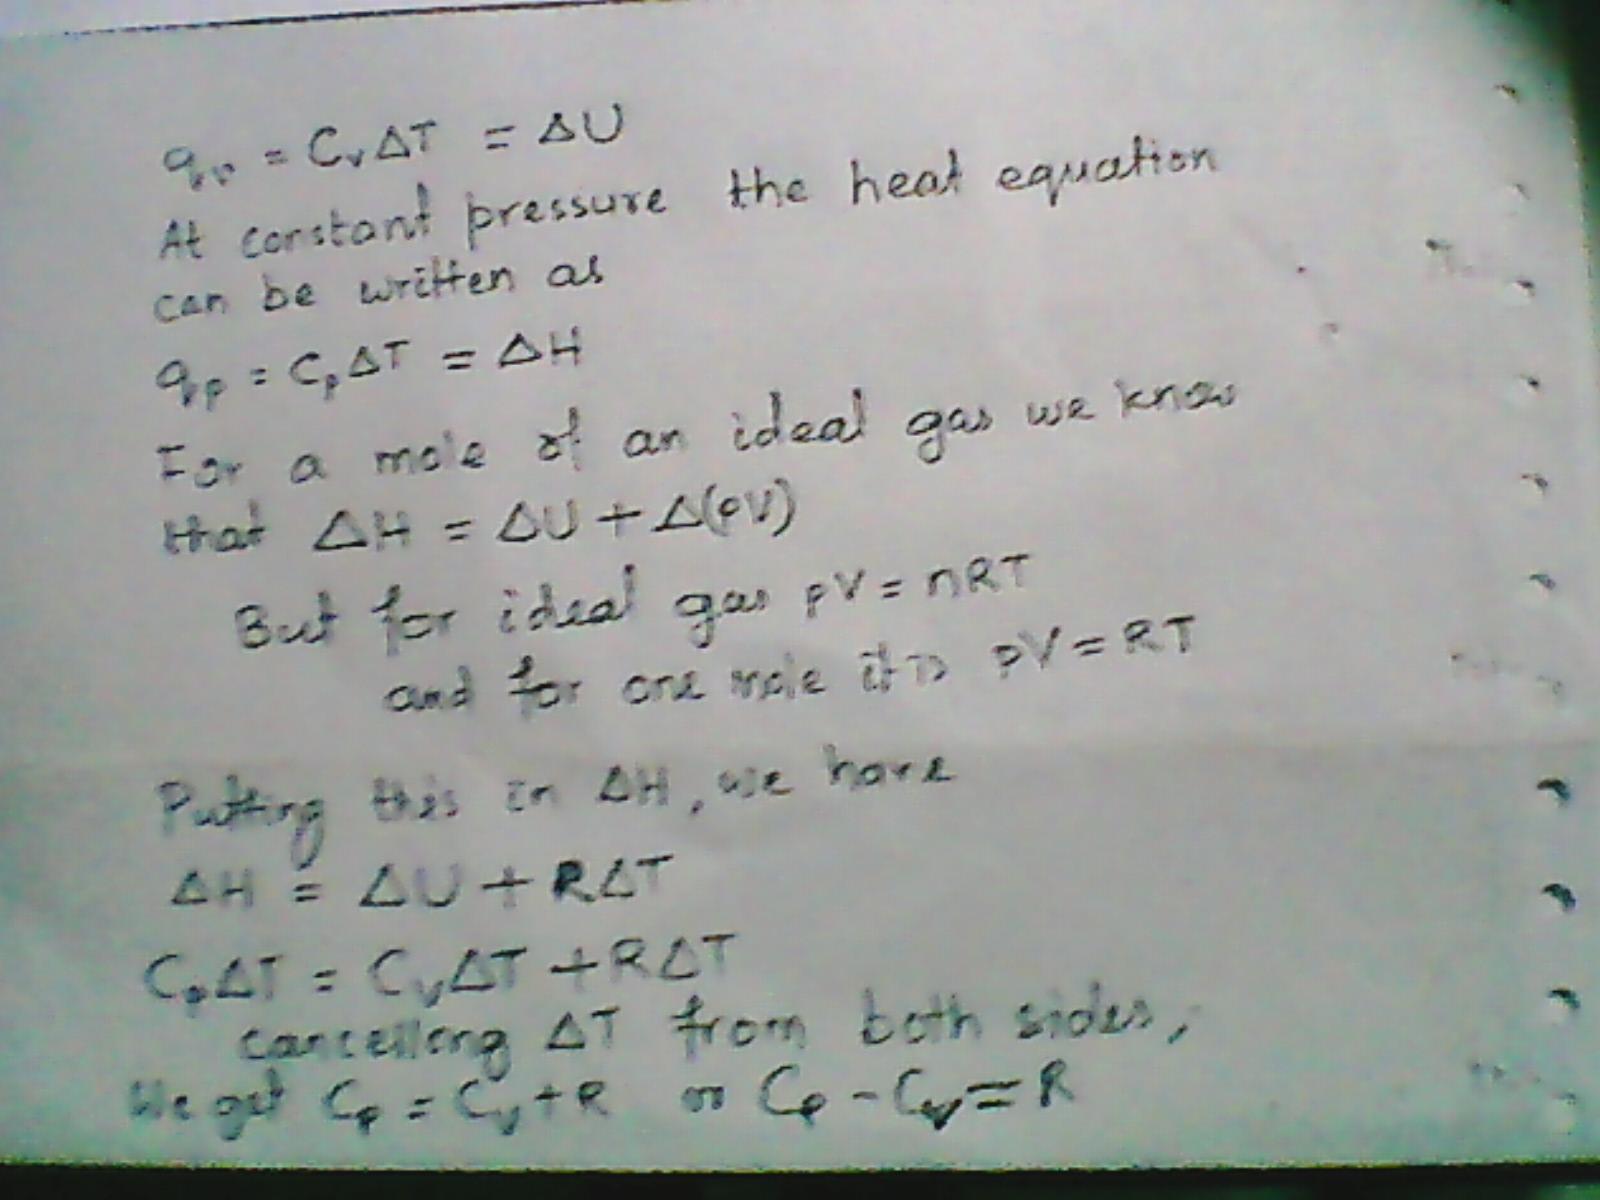 prove that cp